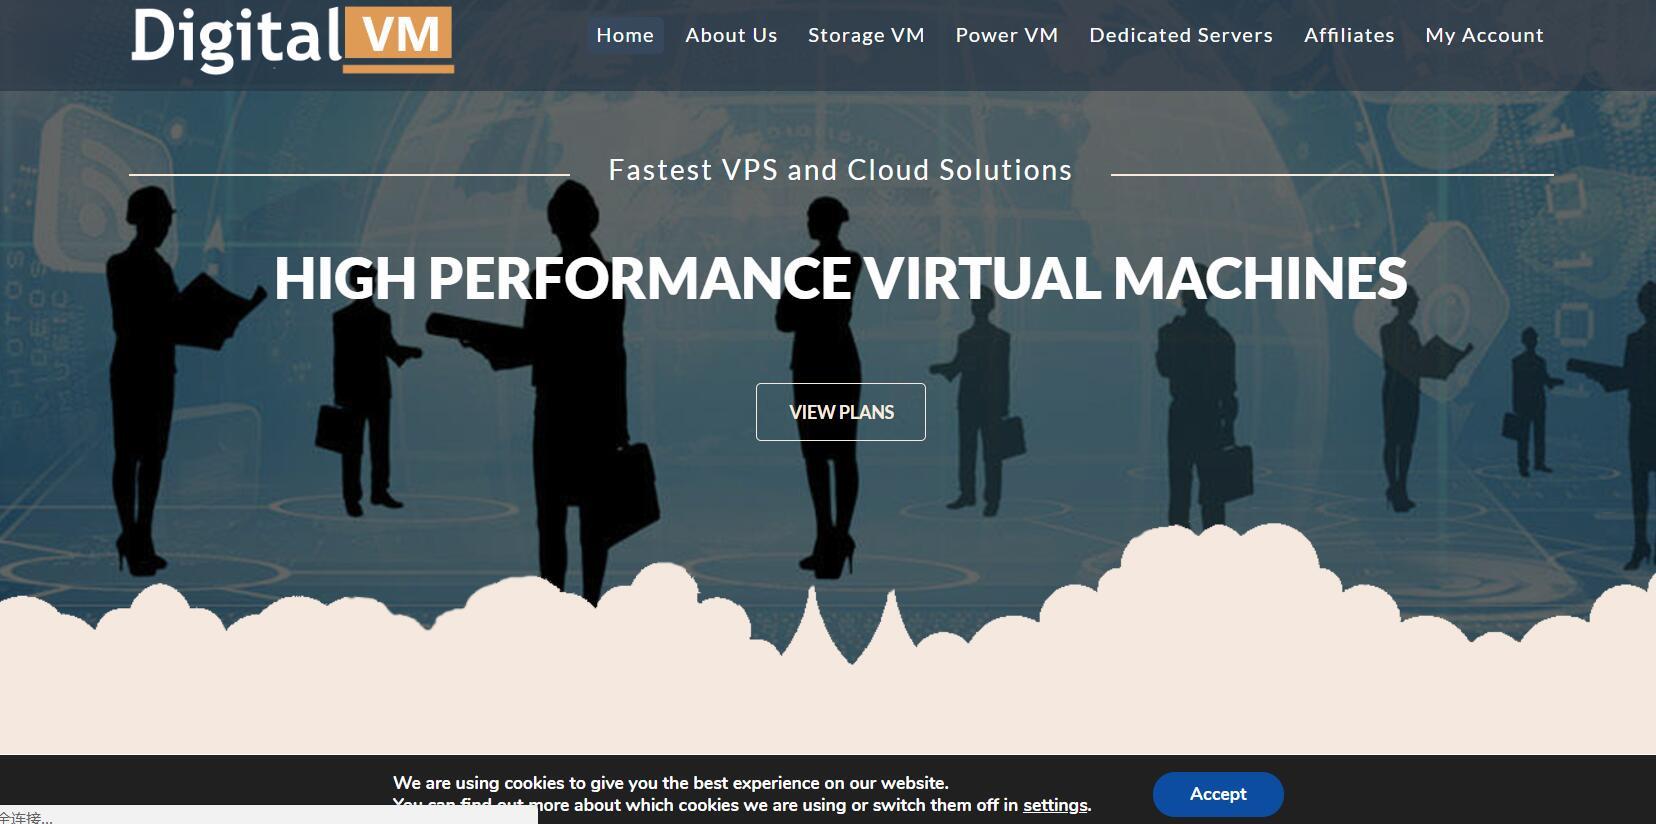 digital-vm:VPS低至$4/月,服务器$80/月,10Gbps超大带宽,不限流量,机房可选:日本\新加坡\美国\英国\西班牙\荷兰\挪威\丹麦